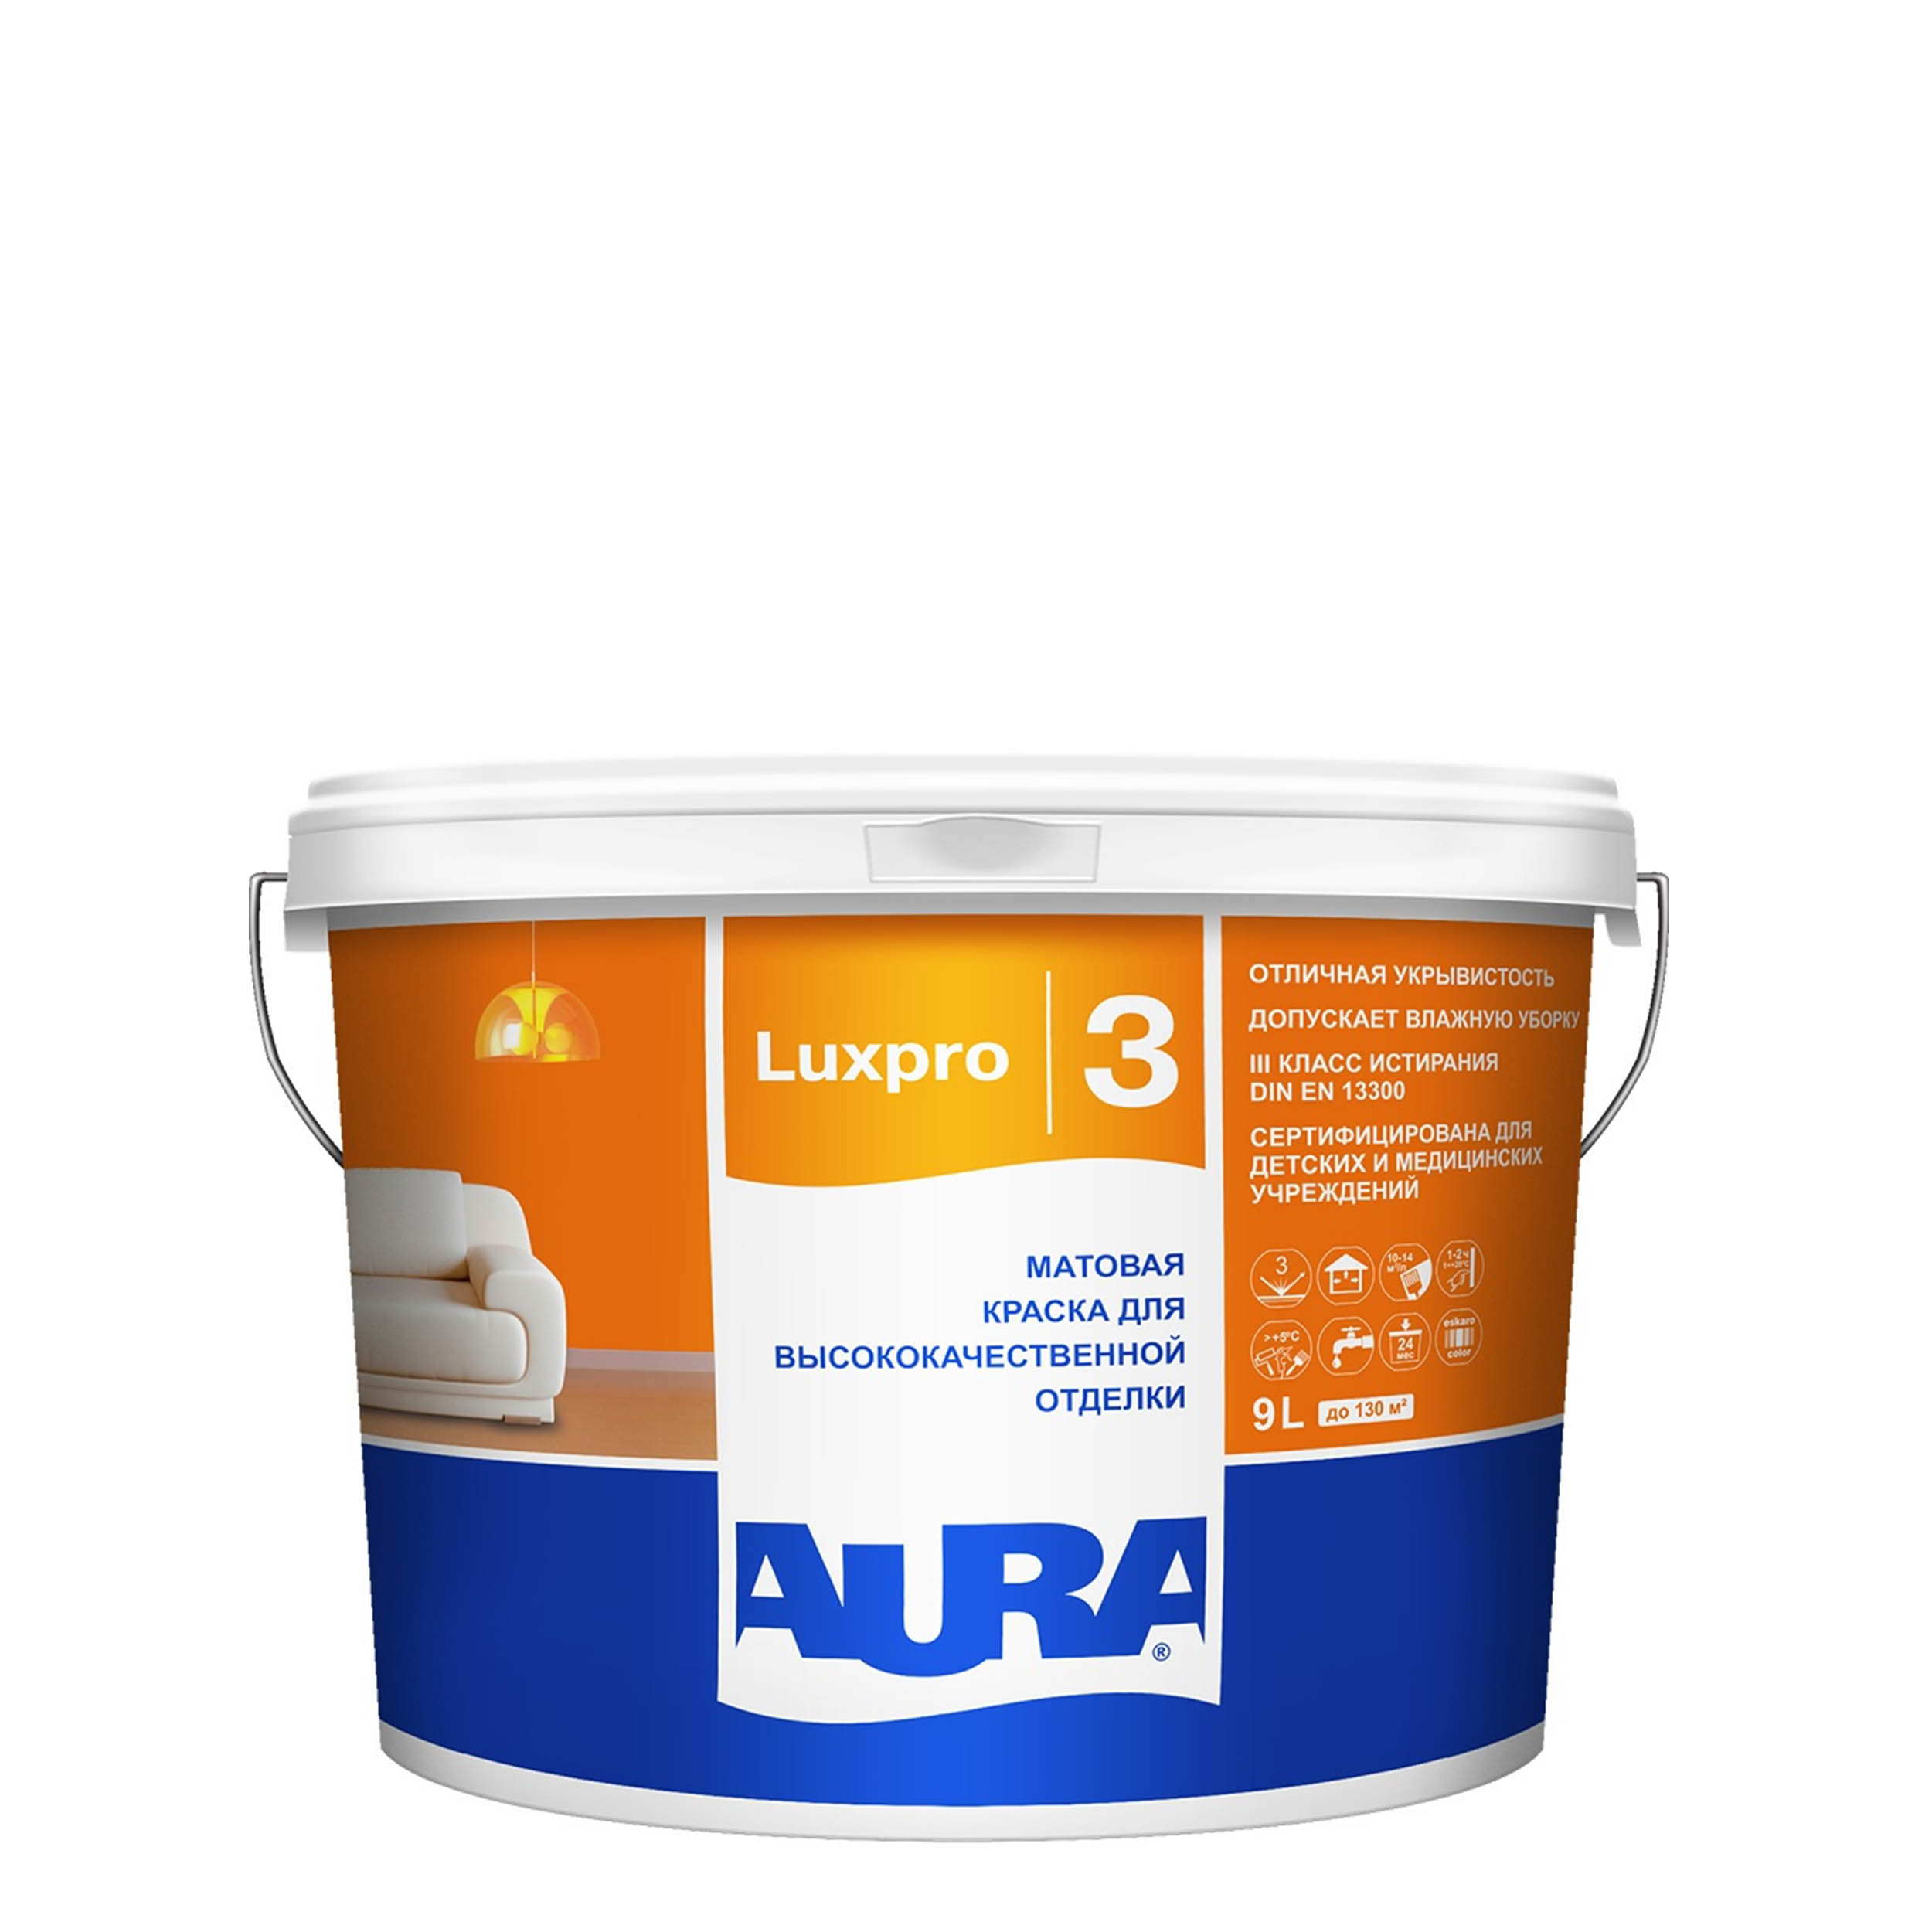 Фото 5 - Краска интерьерная, Aura LuxPRO 3, RAL 1004, 11 кг.